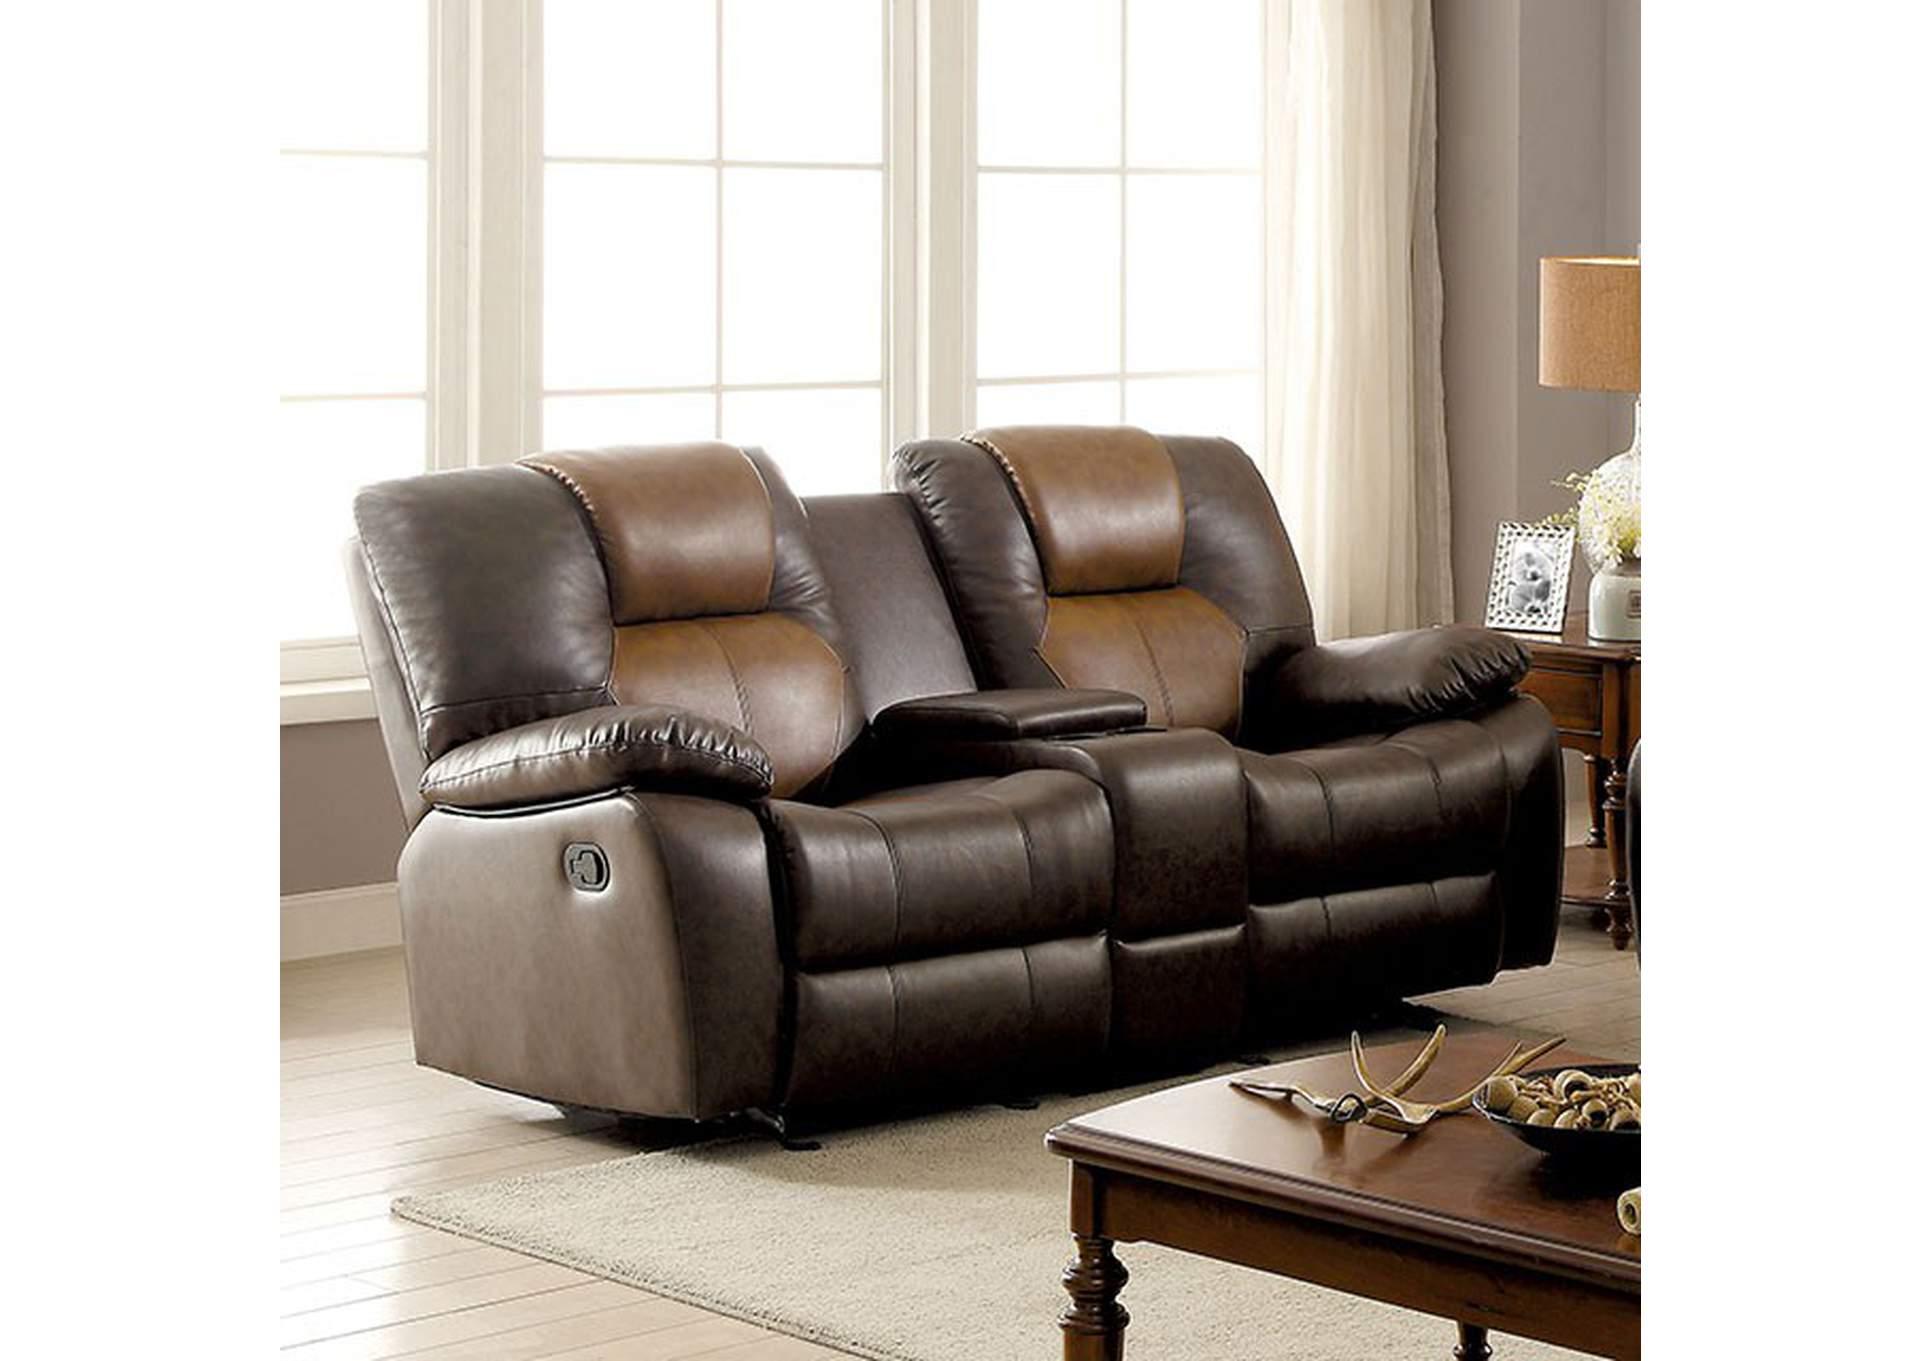 Astonishing Vees Furniture Mattresses Pollux Dark Brown Light Brown Short Links Chair Design For Home Short Linksinfo